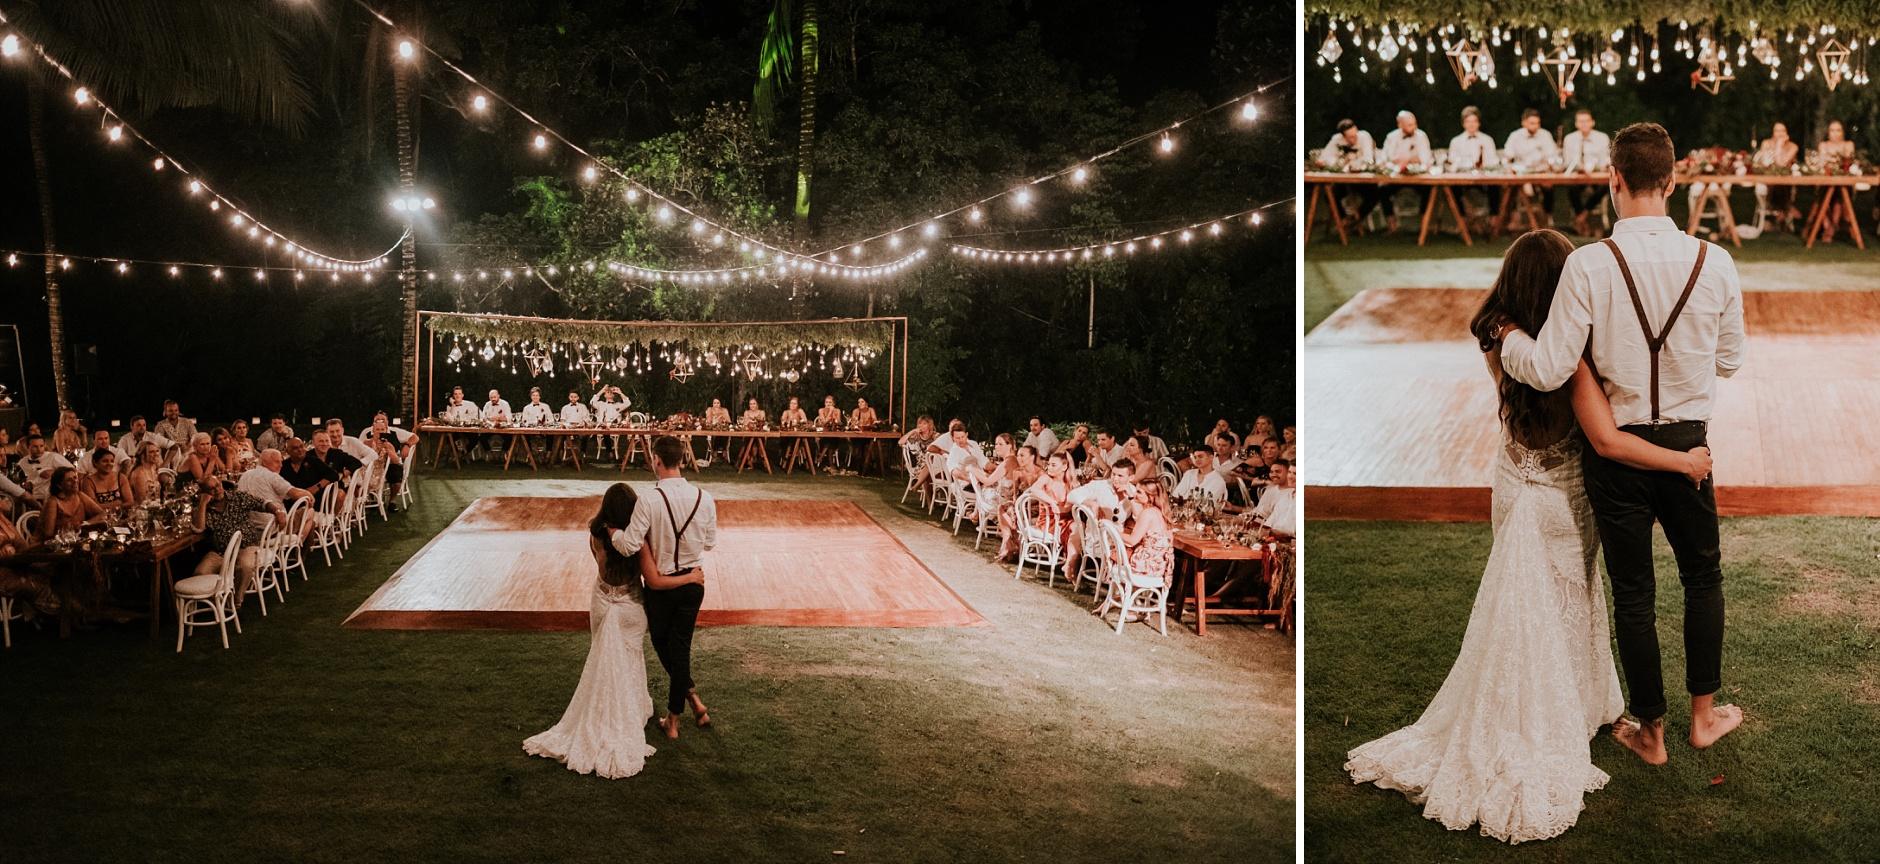 breanna&dan0675a_Bali-Wedding-Photographer.jpg